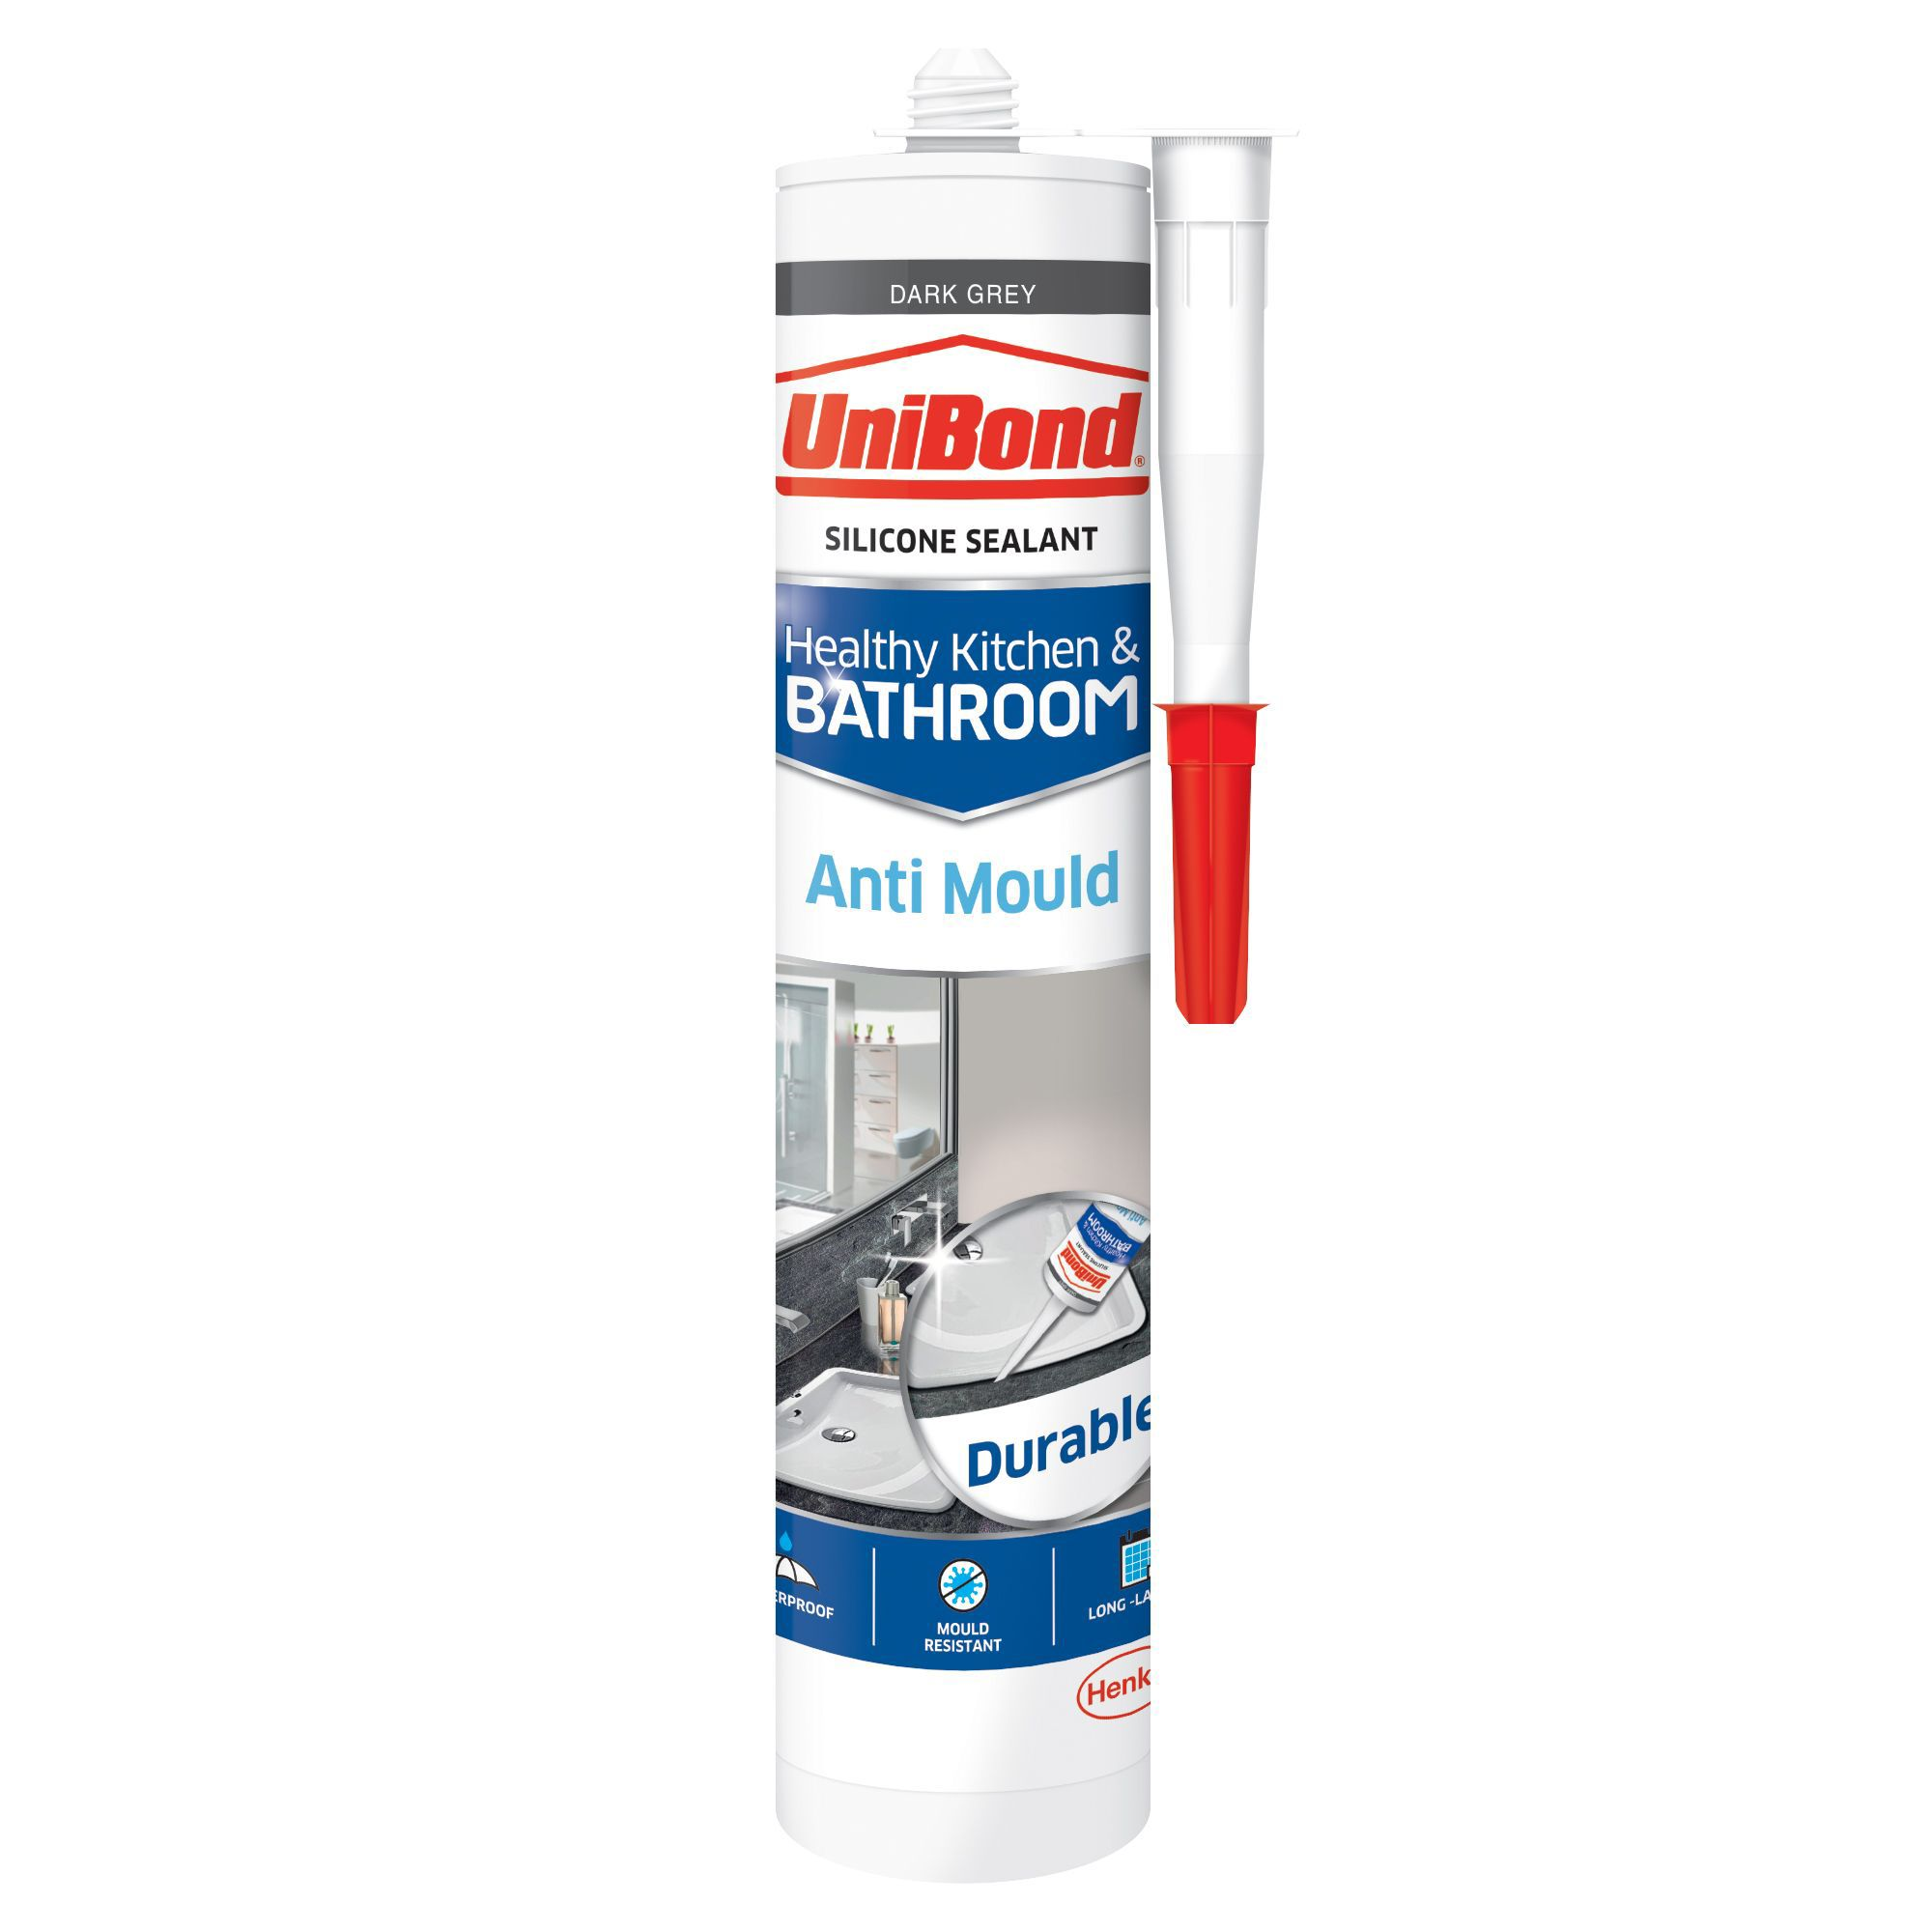 Unibond Anti Mould Dark Grey Kitchen Amp Bathroom Sealant